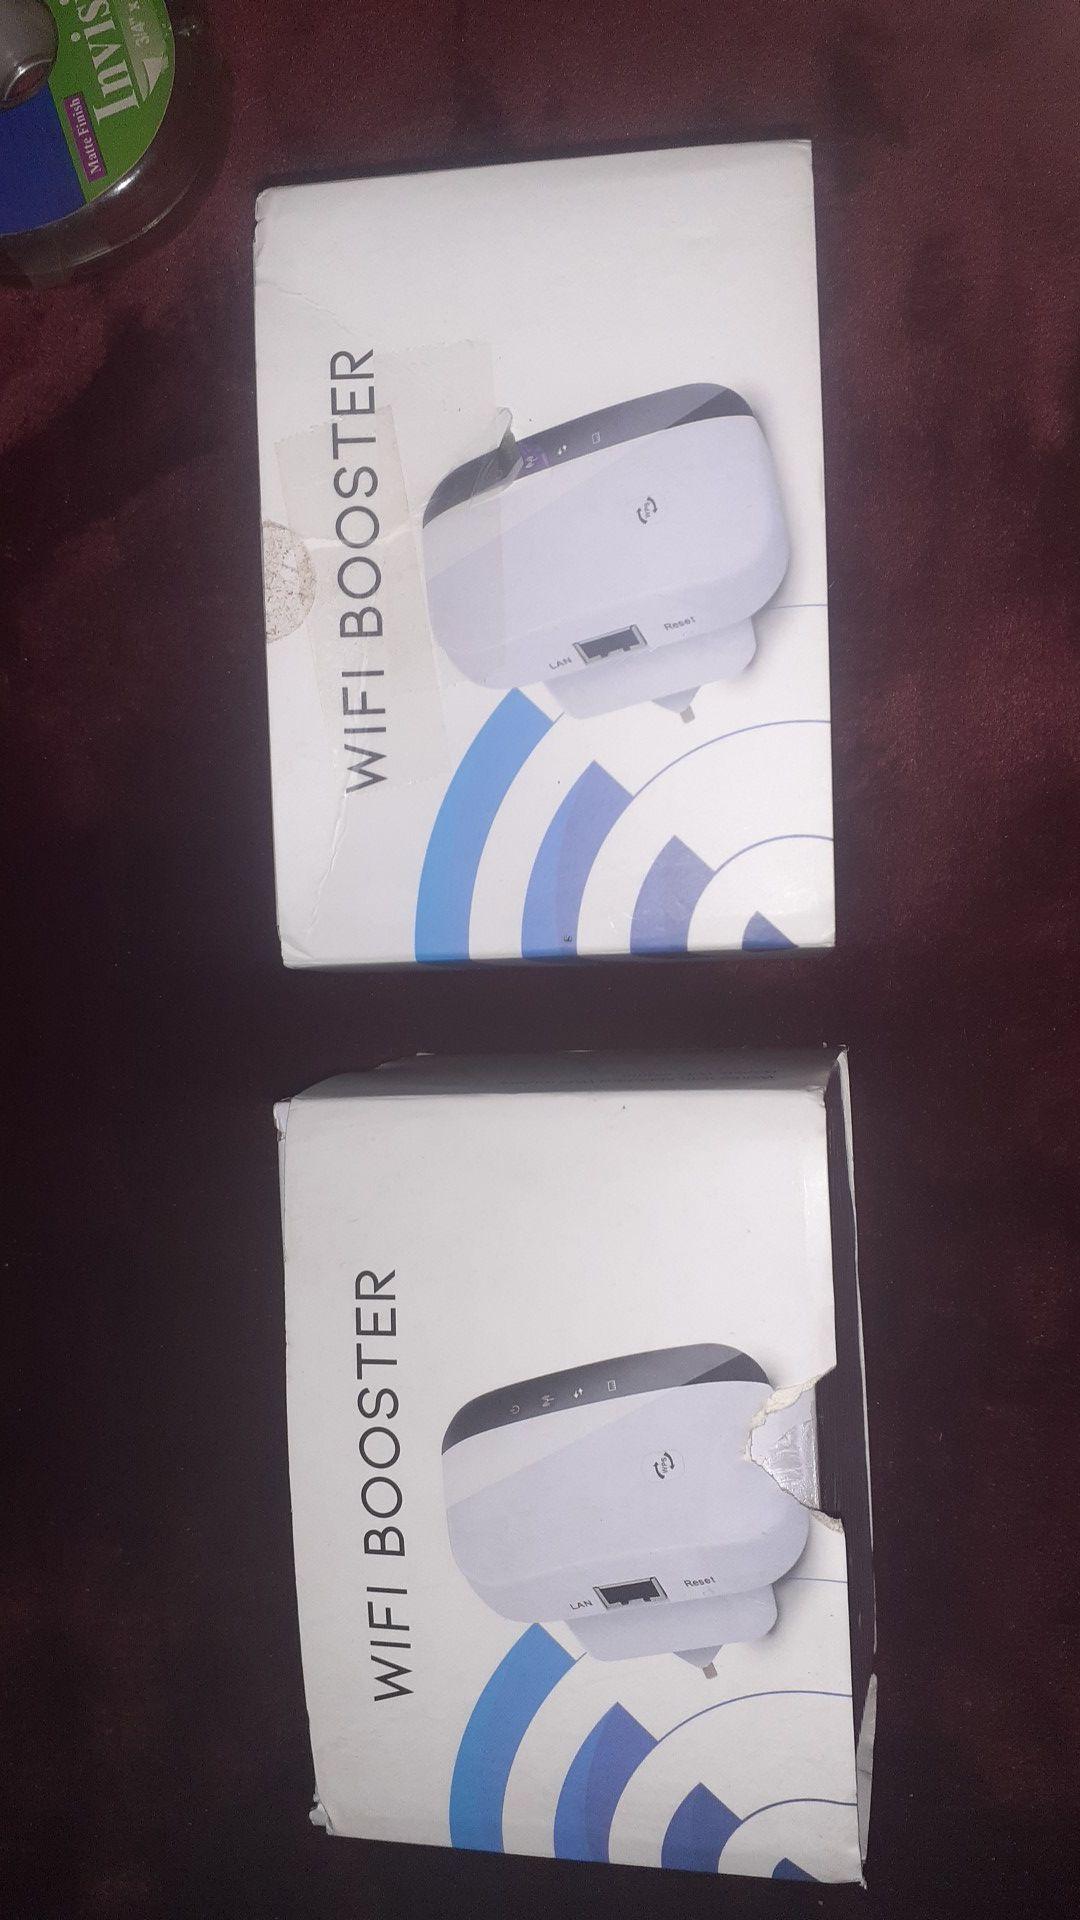 2 WIFI Boosters